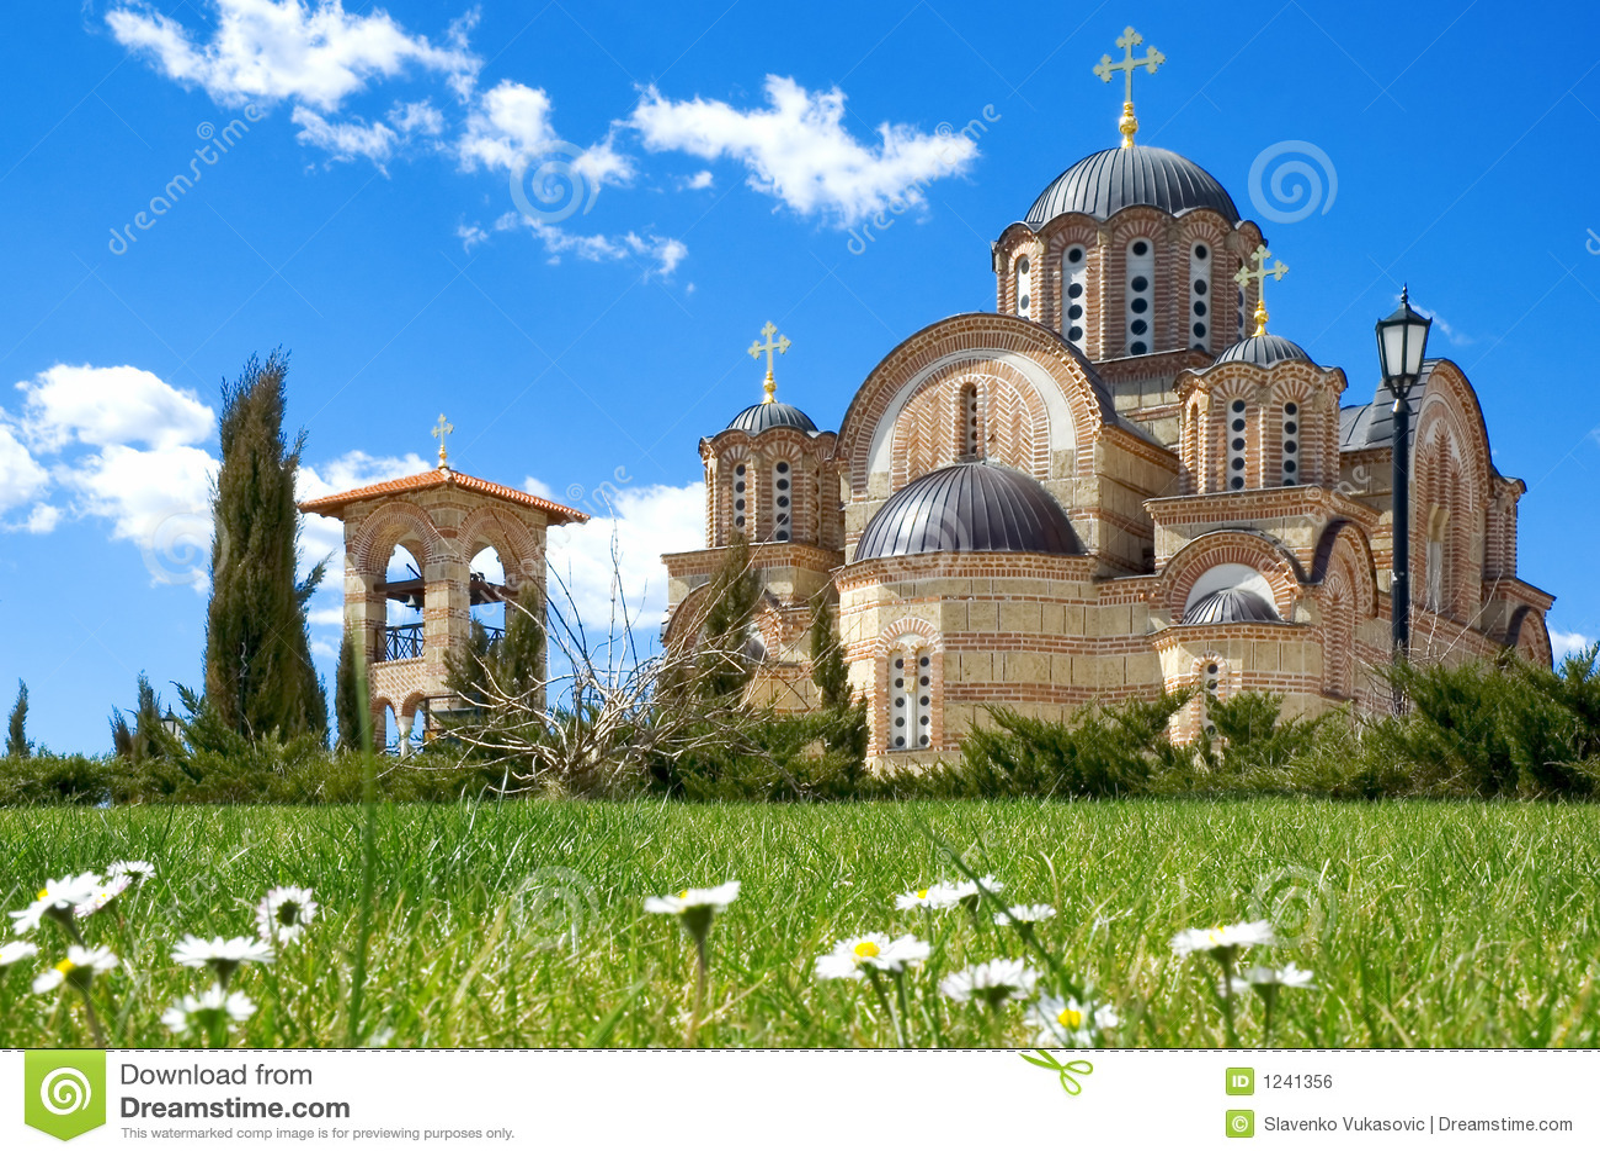 ChurchOrthodox